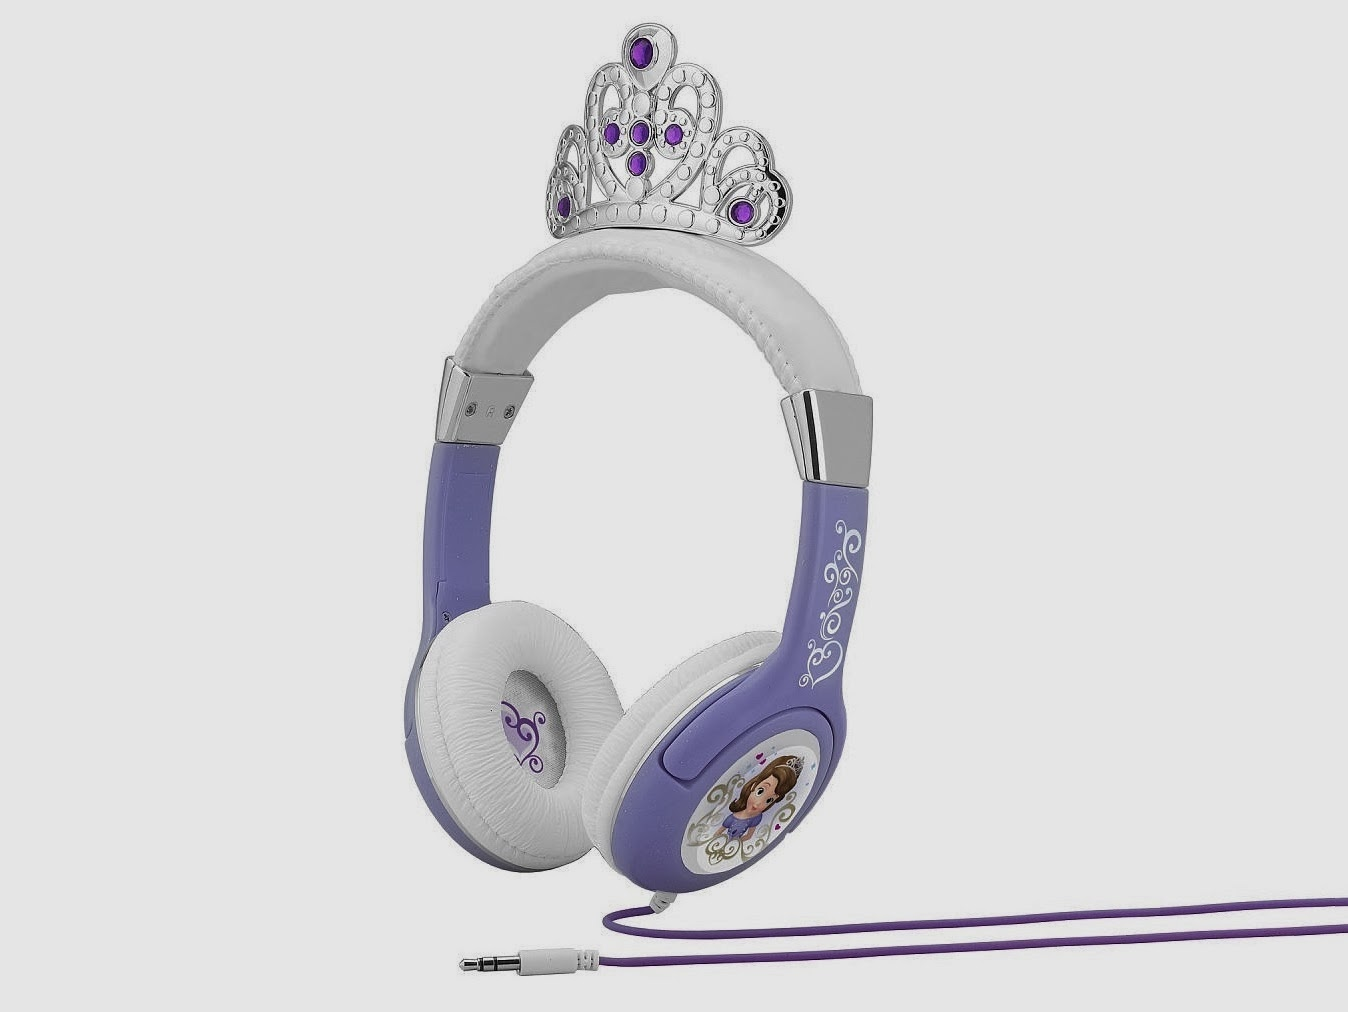 Sofia the First Princess headphones